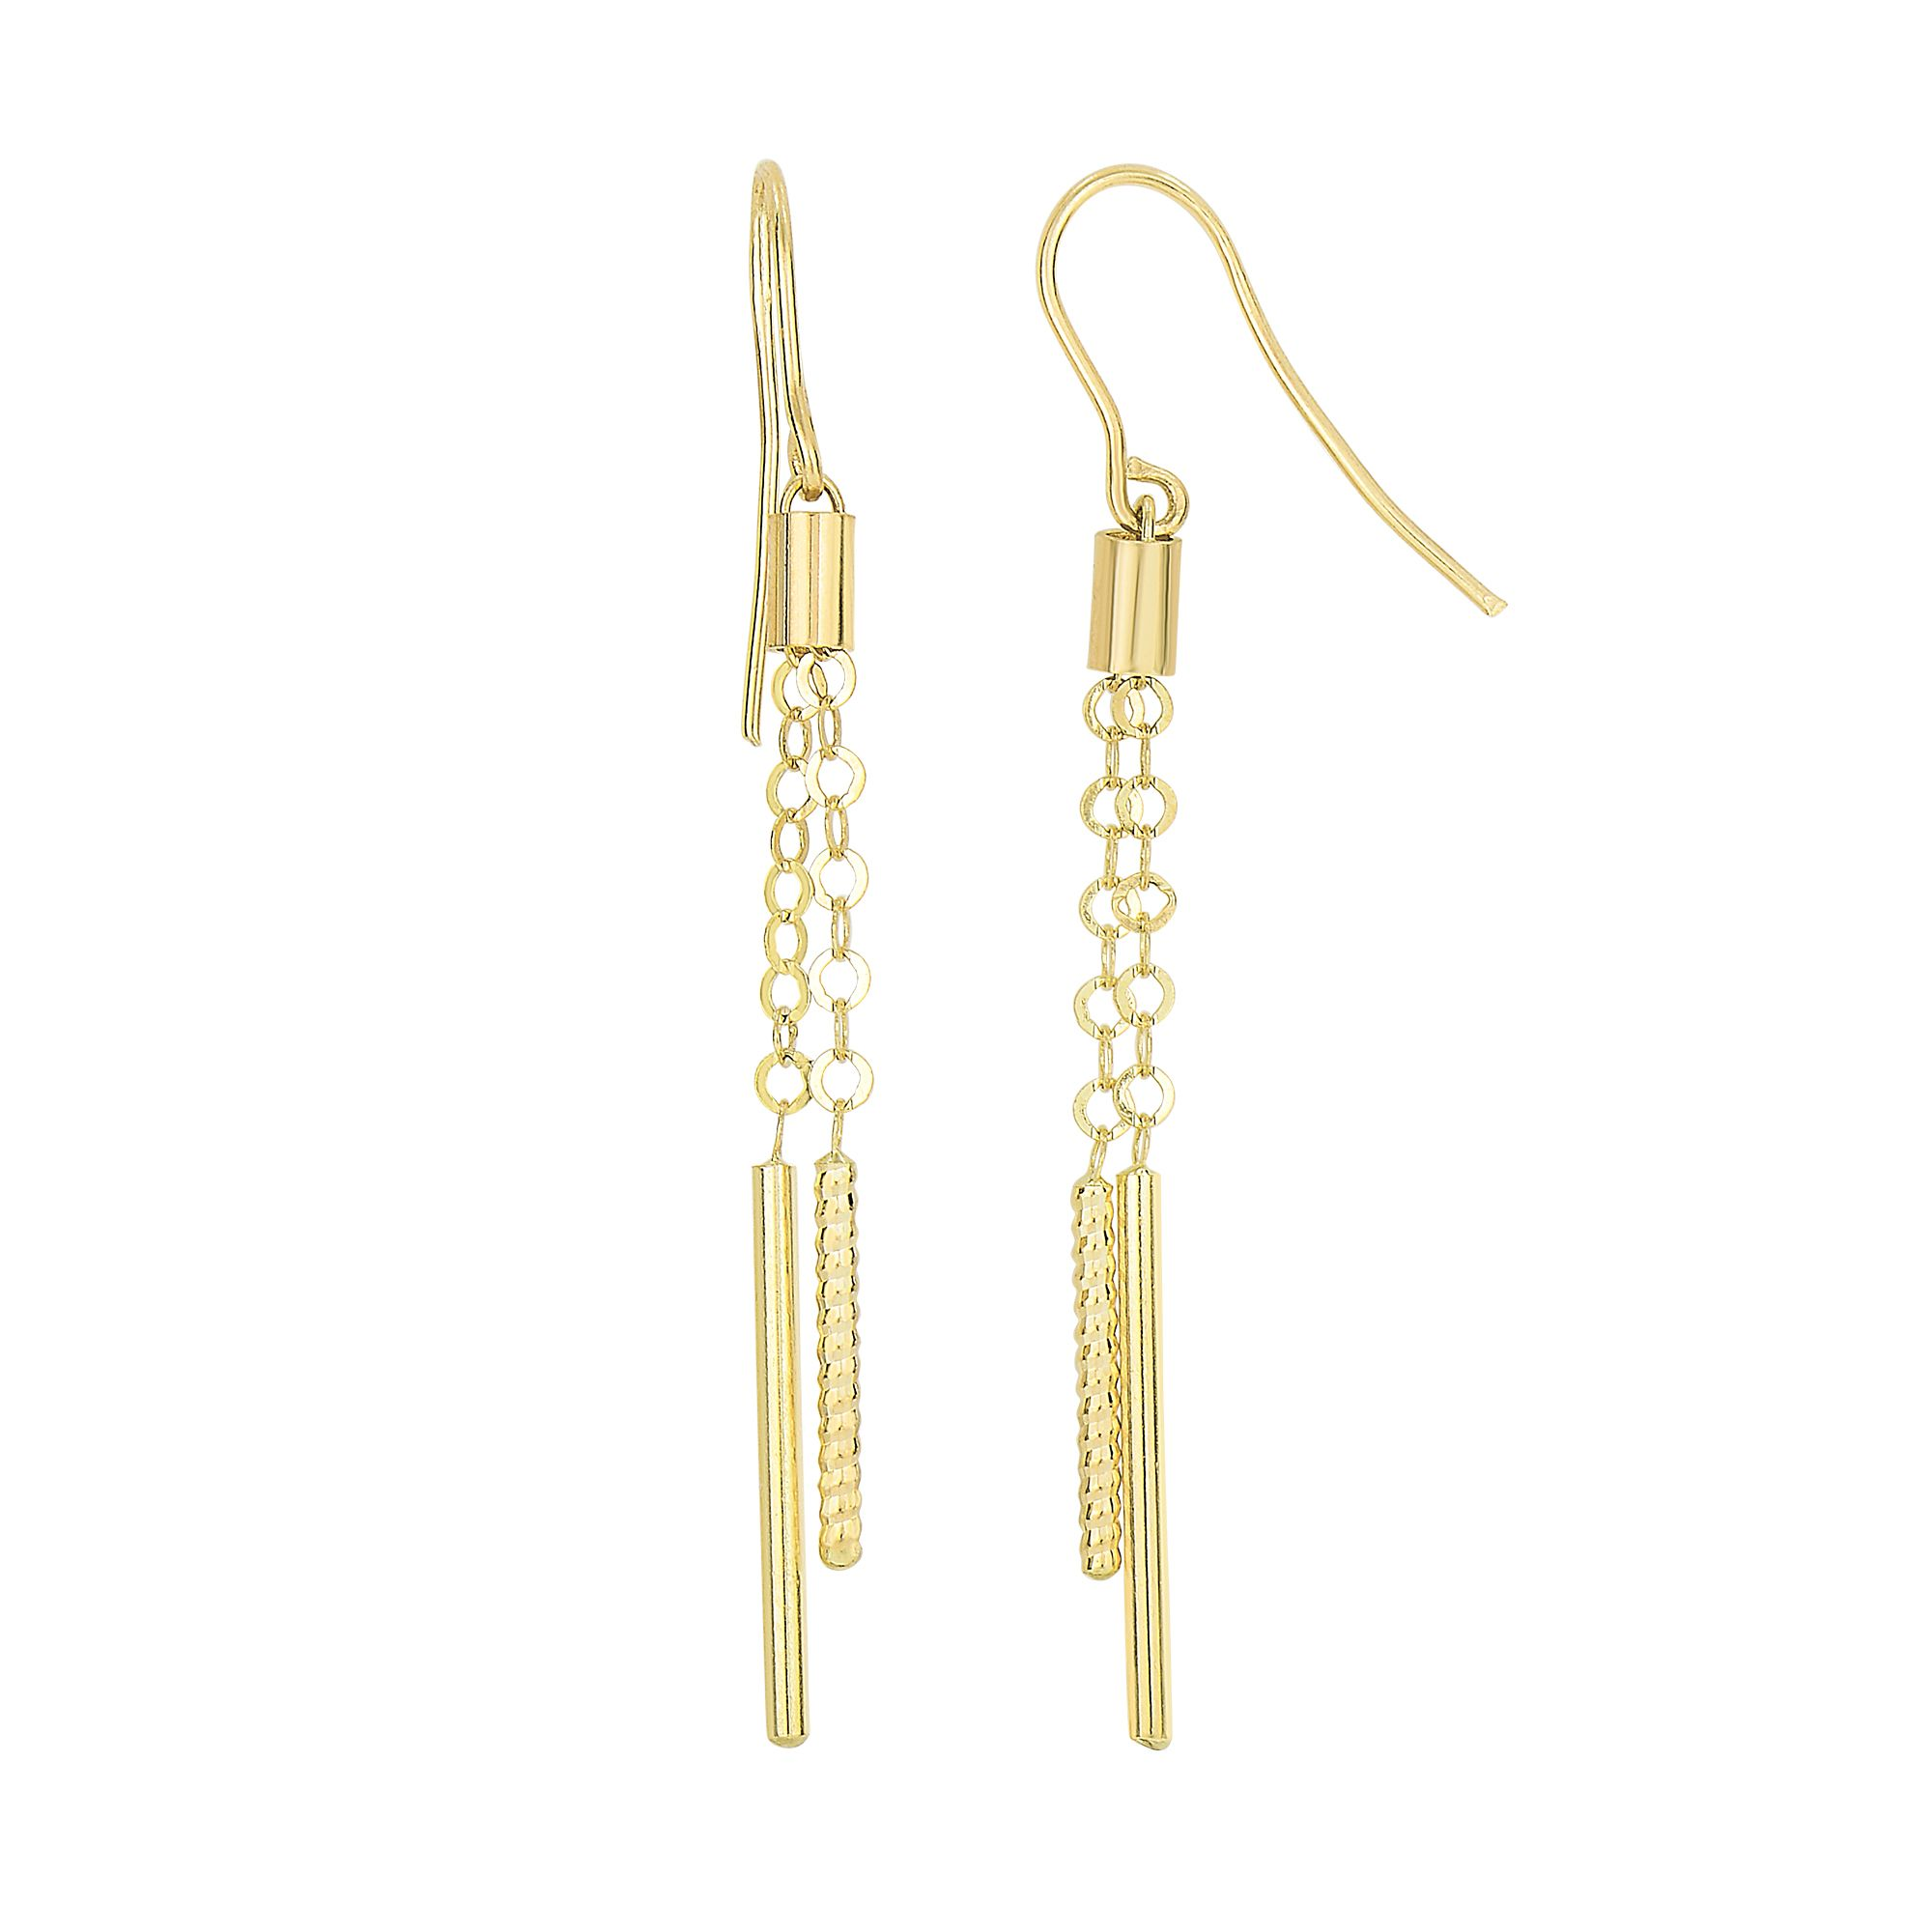 14 Karat Yellow Gold Shiny Double Cylinder Dangling Earrings